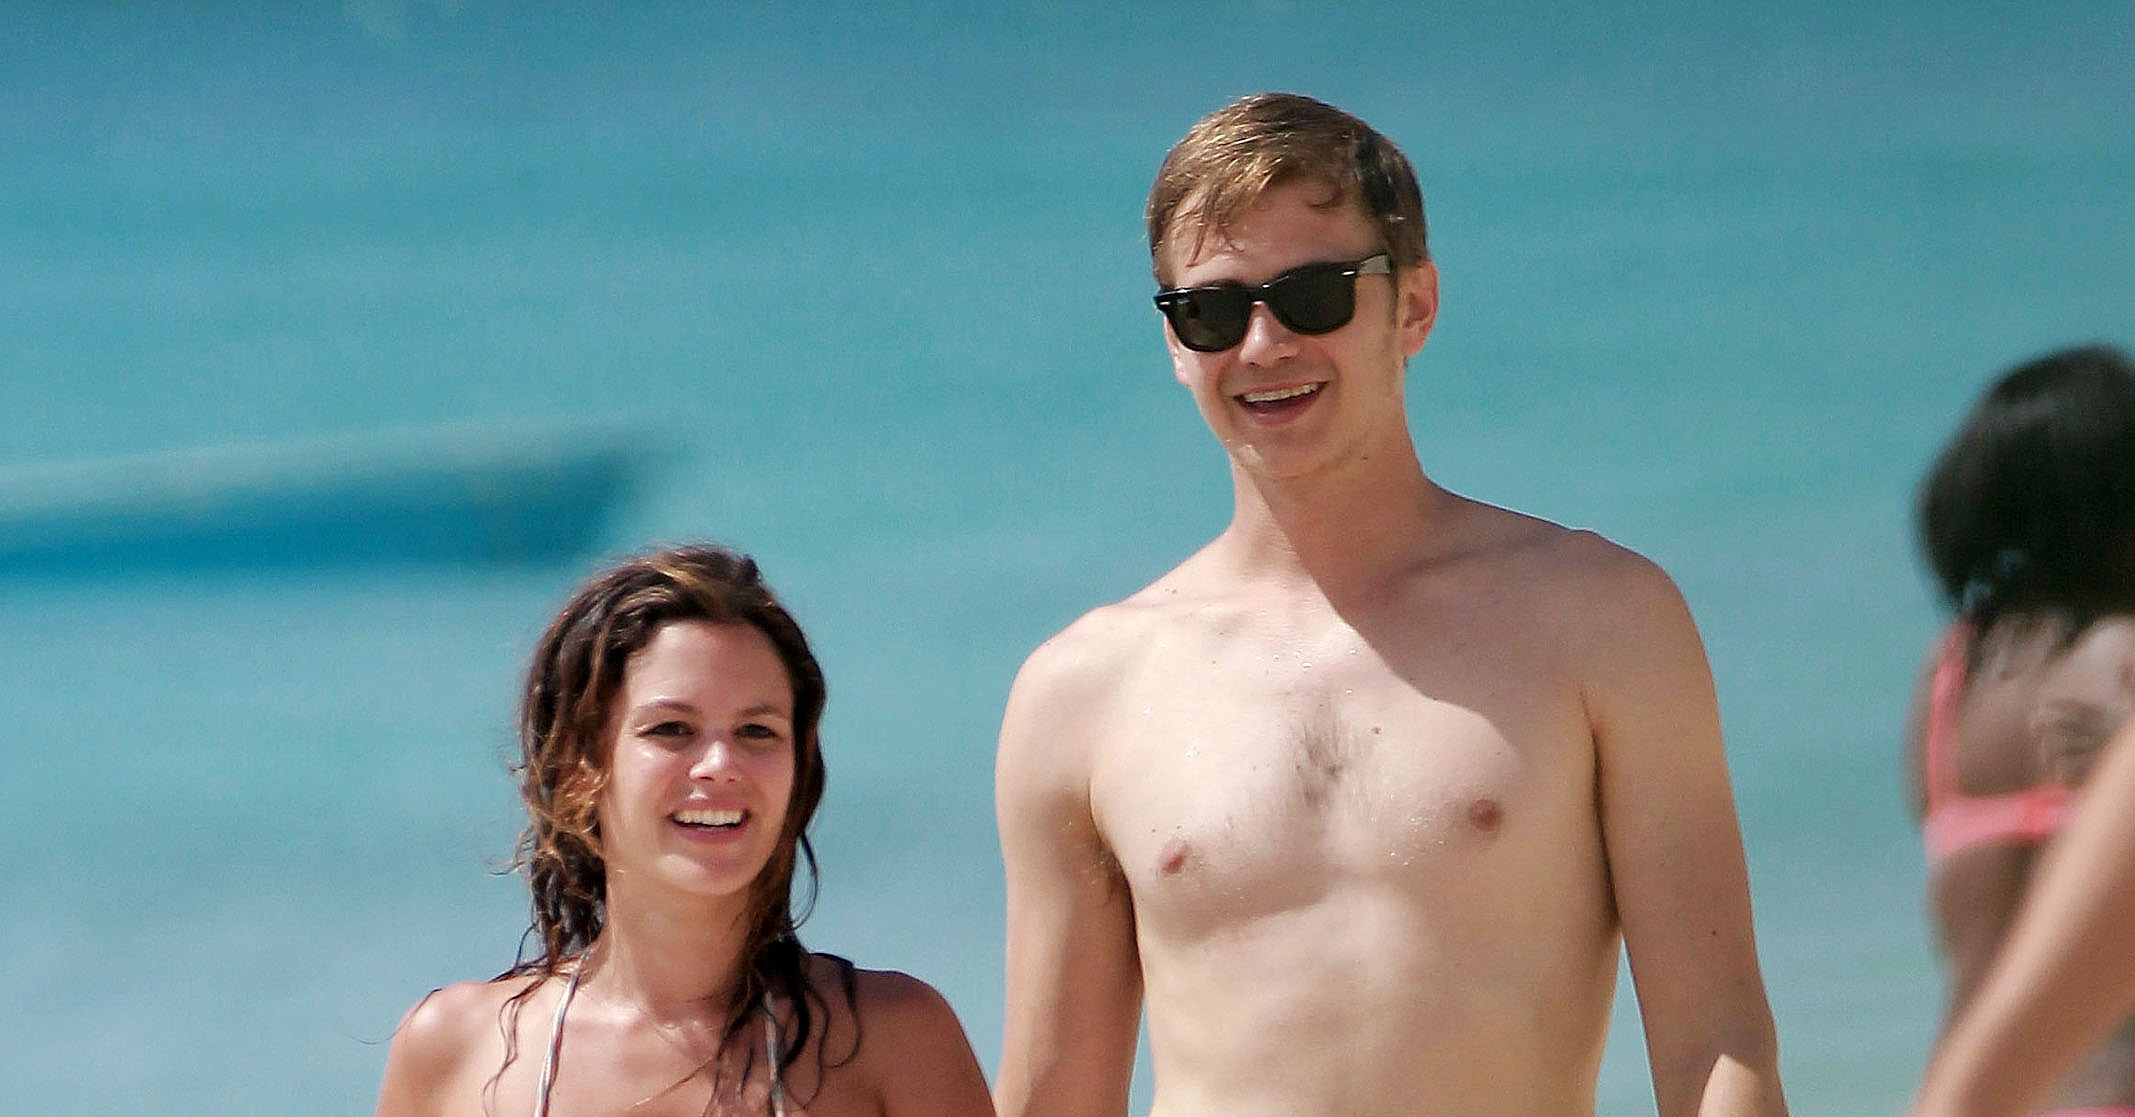 Bikini-clad-Rachel-Bilson-boyfriend-Hayden-Christensen-took jpgRachel Bilson Boyfriend